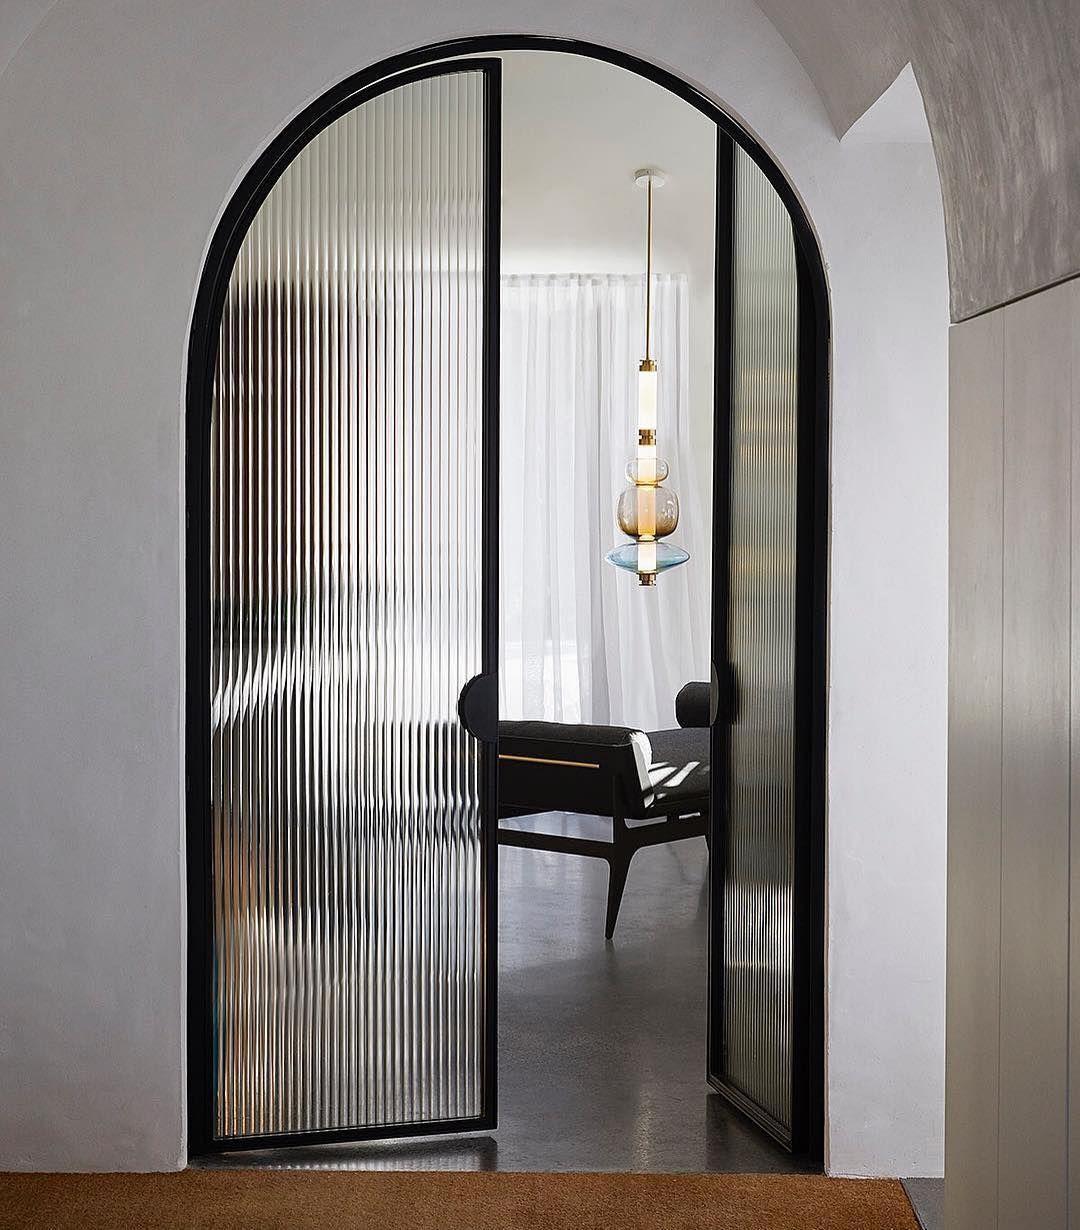 Sarah Dippold Design On Instagram New Favorite Gabrielscott Gorgeous Light Fixture Daybed Photographed Th In 2020 Glass Doors Interior Arched Doors Door Design